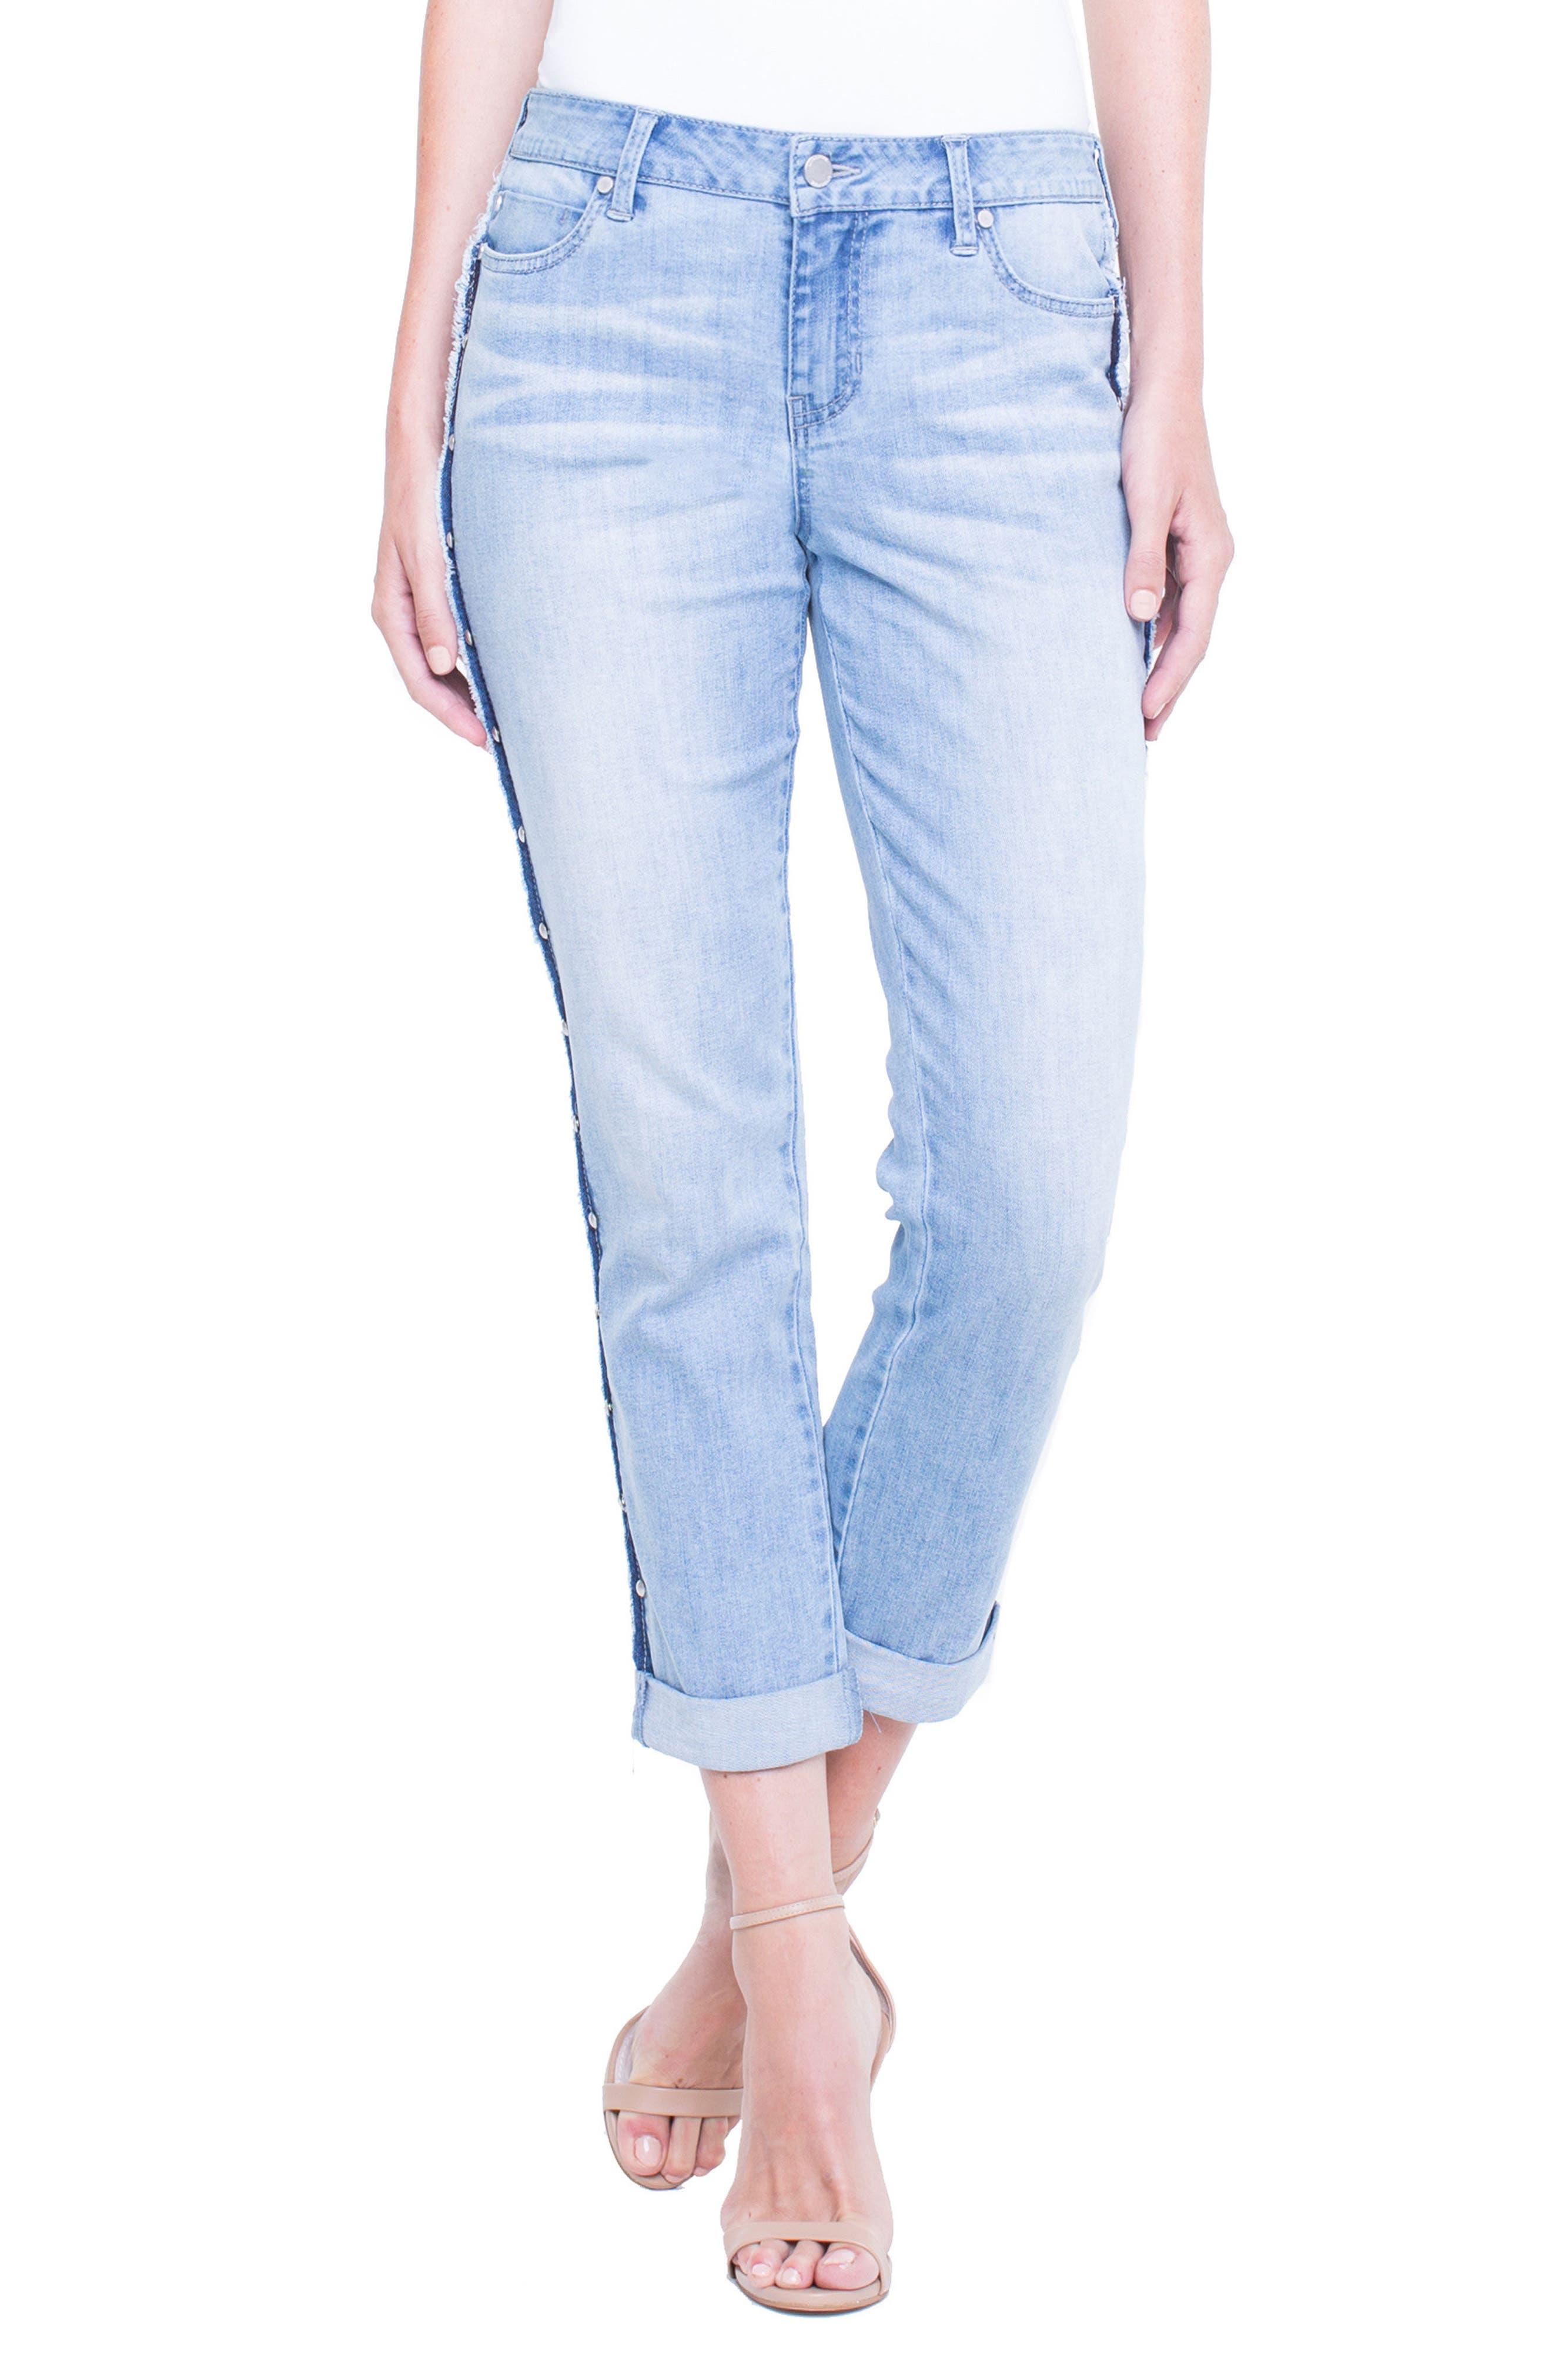 Main Image - Liverpool Jeans Company Perry Slim Side Stud Boyfriend Jeans